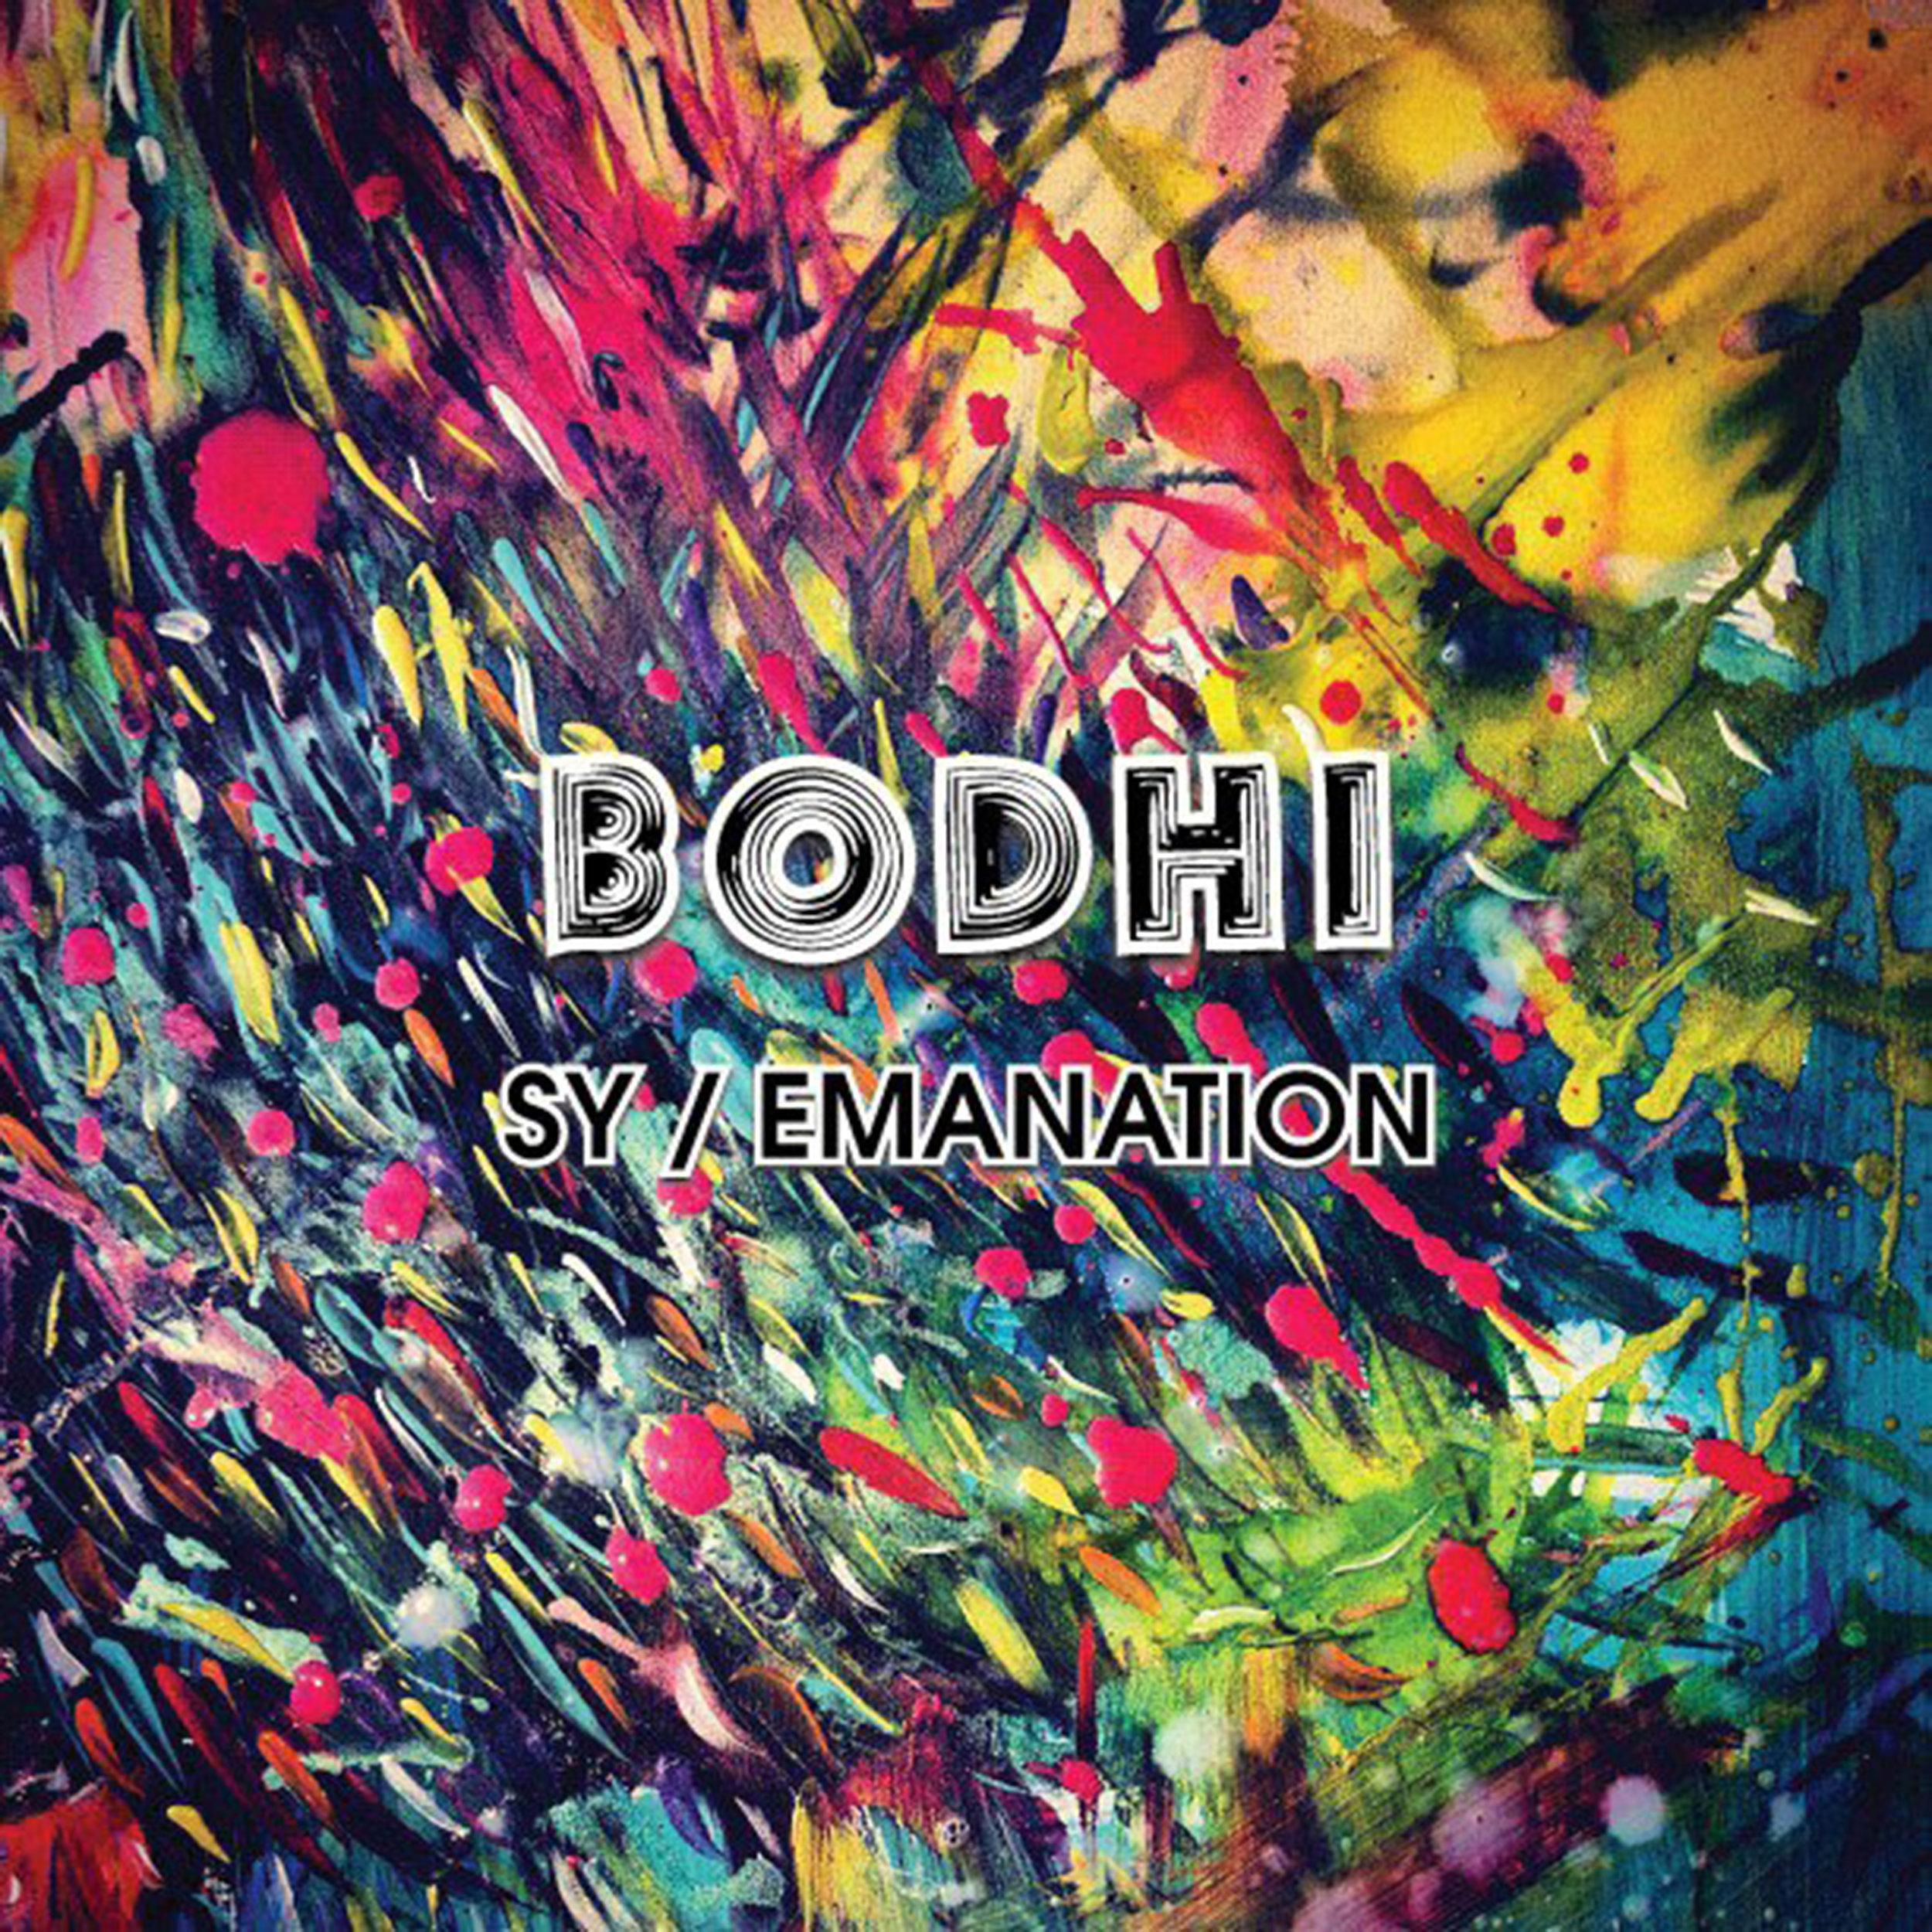 Bodhi - Sy/Emanation - LISTEN / BUY